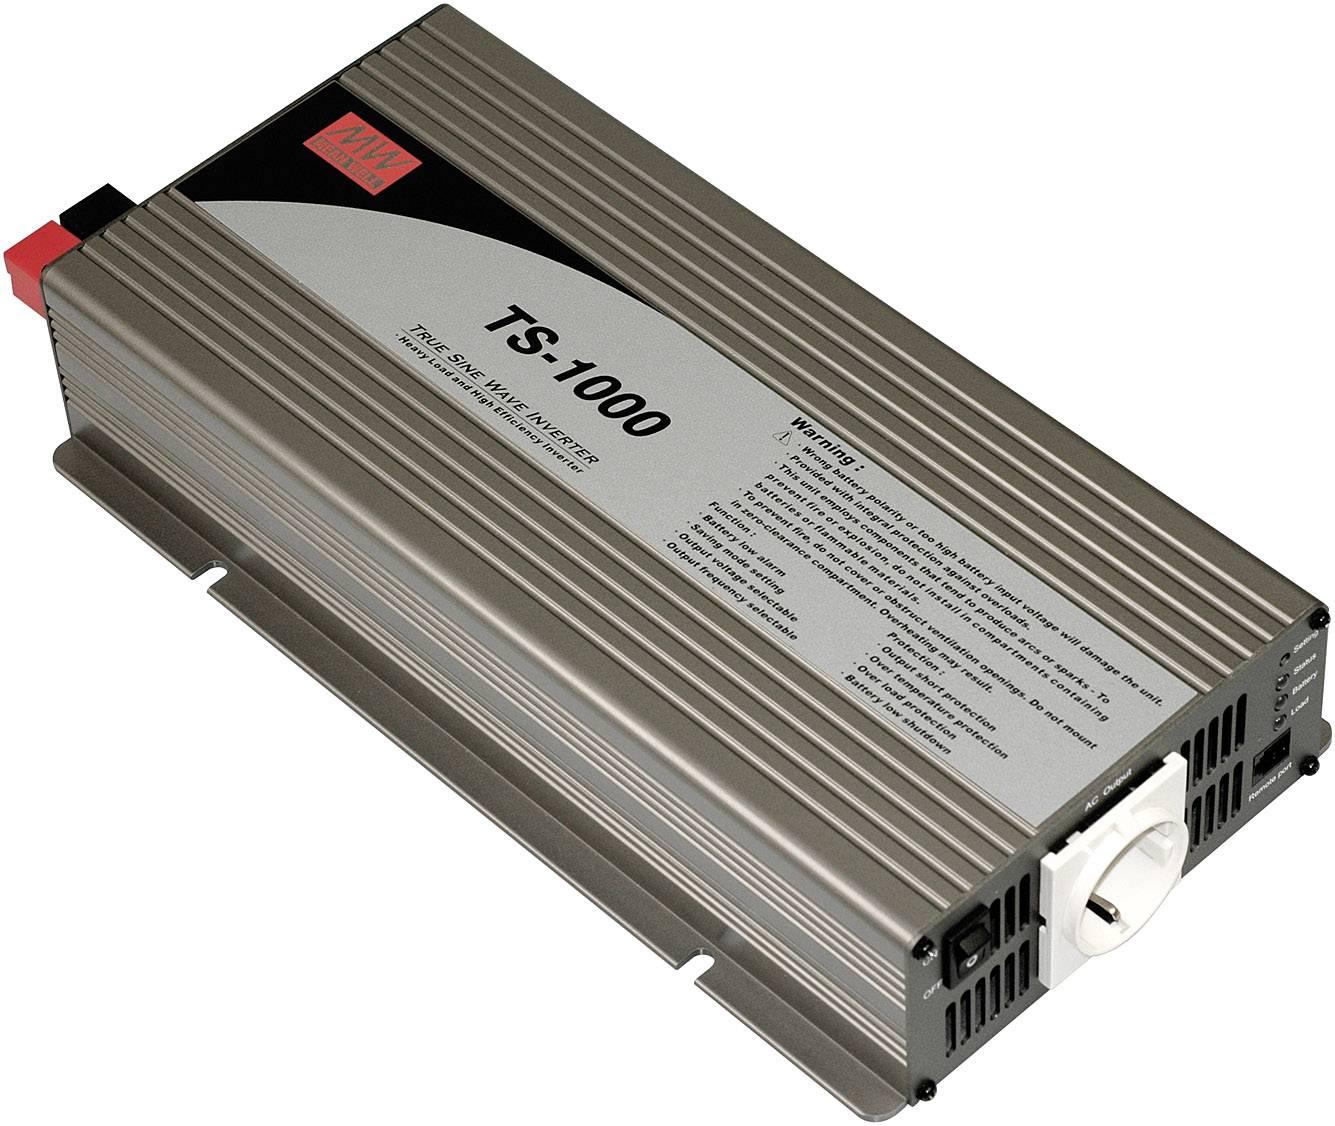 Menič napätia DC / AC Mean Well TS-1000-212B, 1000 W, 12 V/DC/1000 W